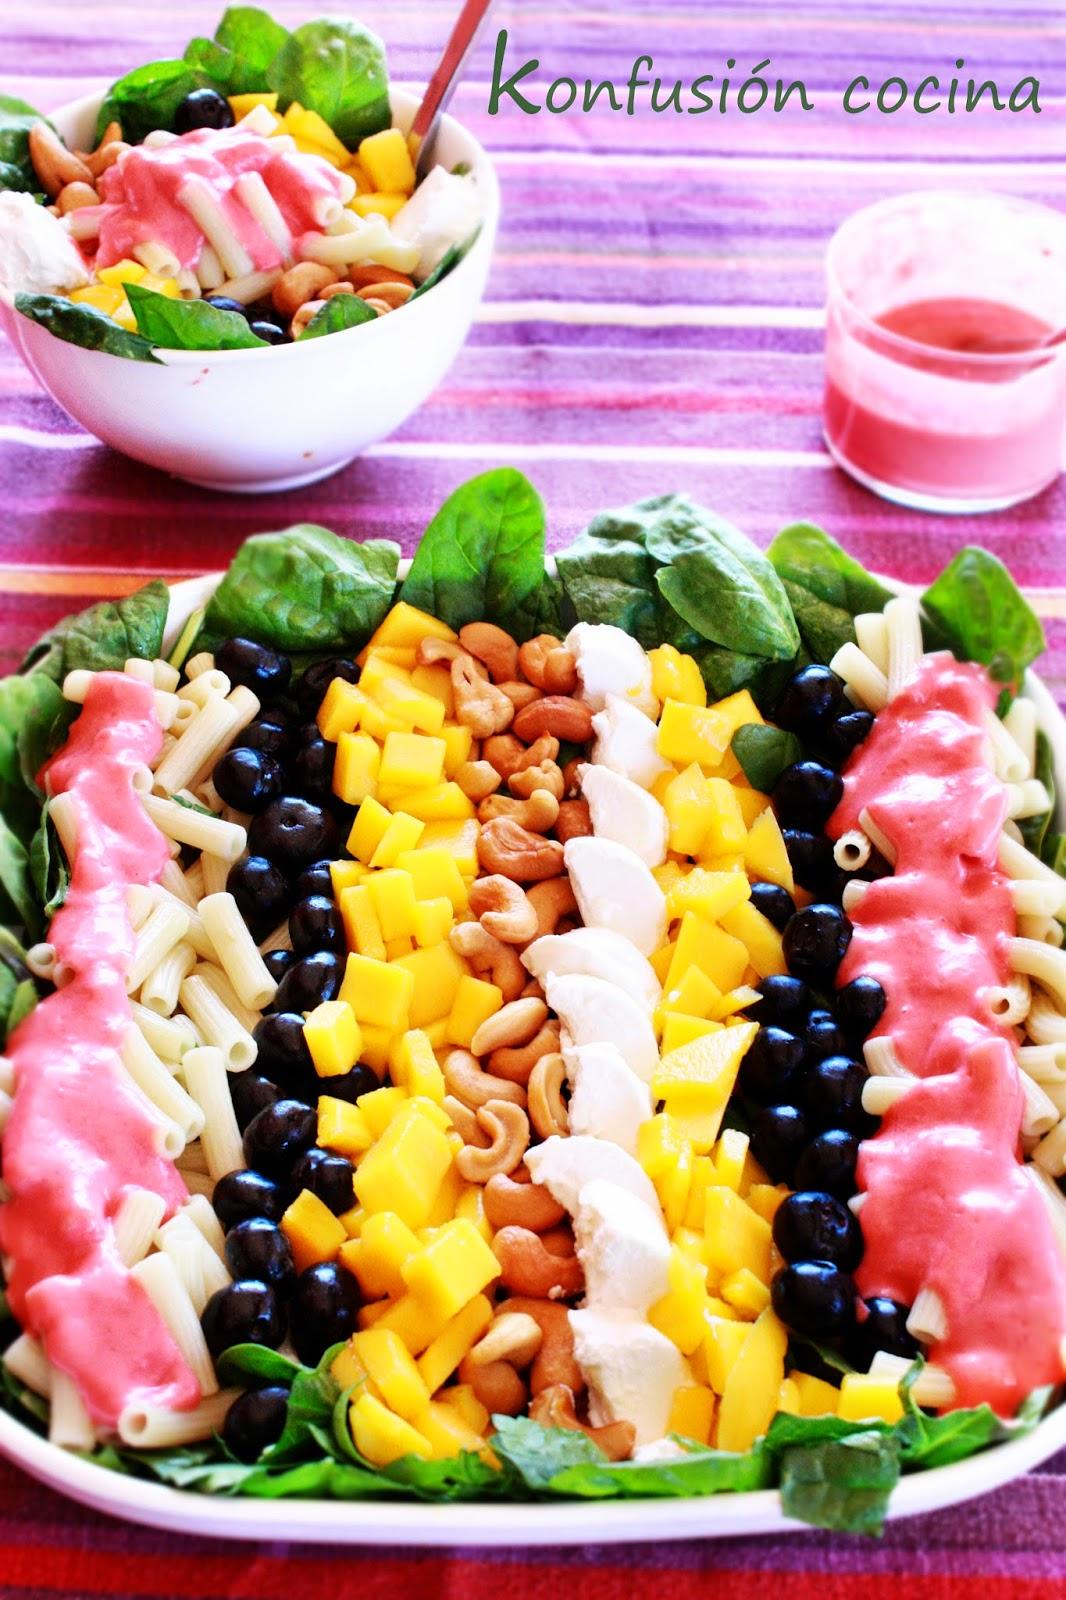 anacardos frutos secos pasta macarrones blueberry salad espinach chesse coat vinaigrette Macaroni cashew nuts Raspberry